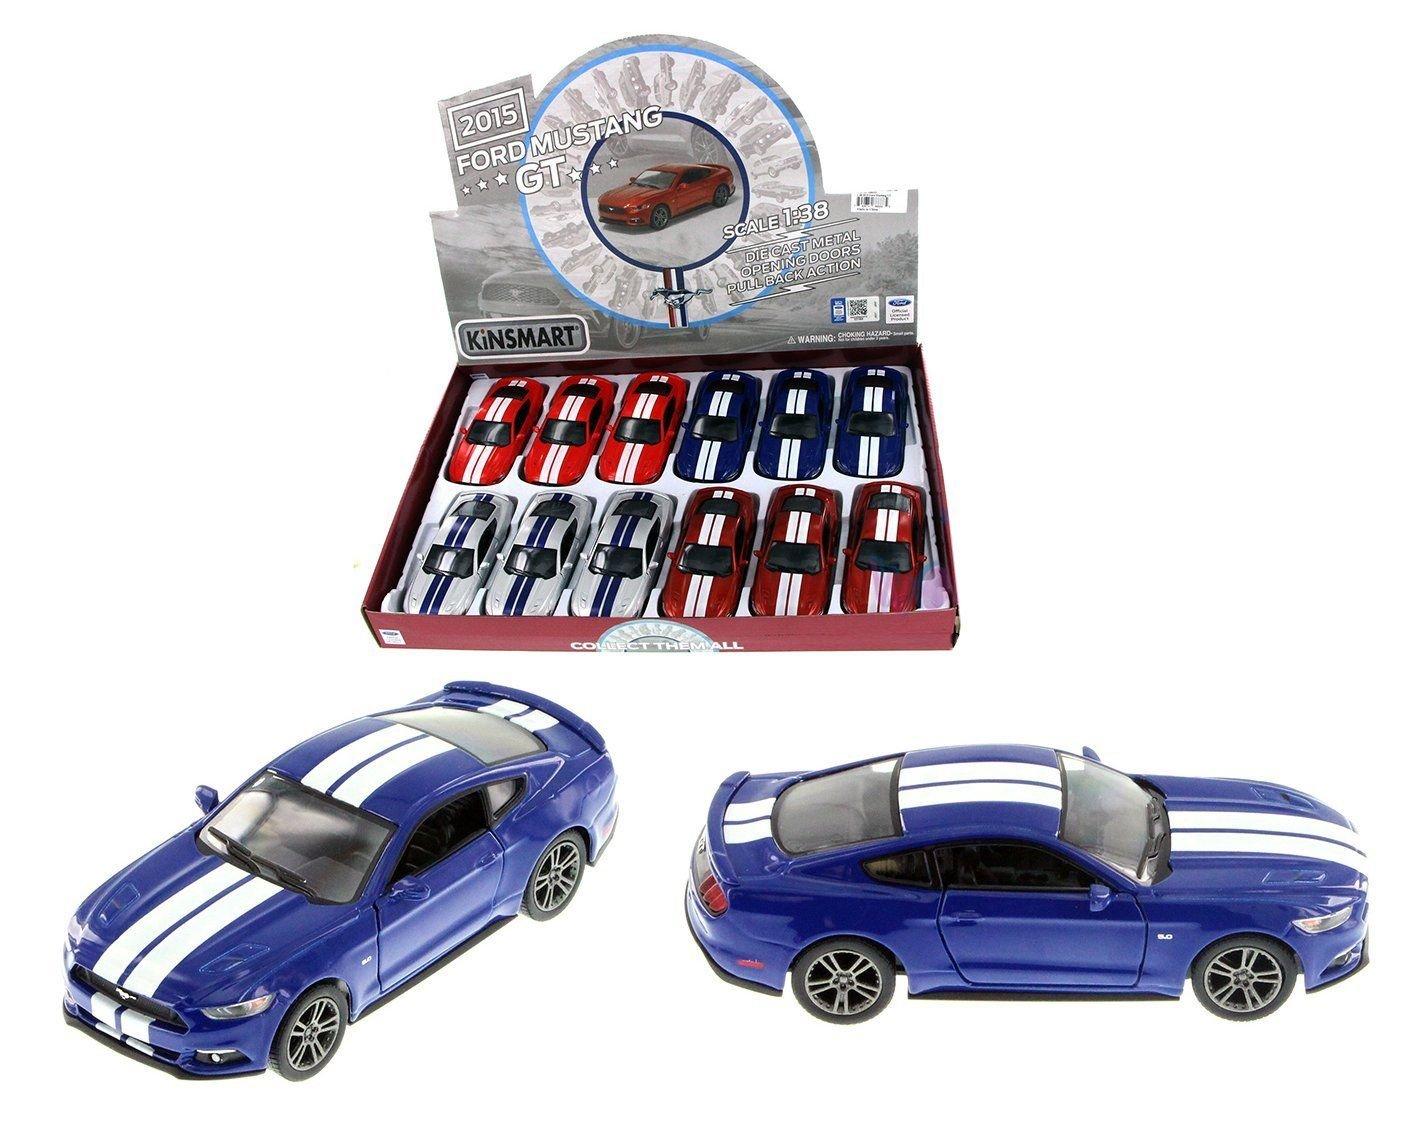 New 1 38 KINSMART DISPLAY BLUE COLOR 2015 FORD MUSTANG GT WITH STRIPES Diecast Model Car By KINSMART